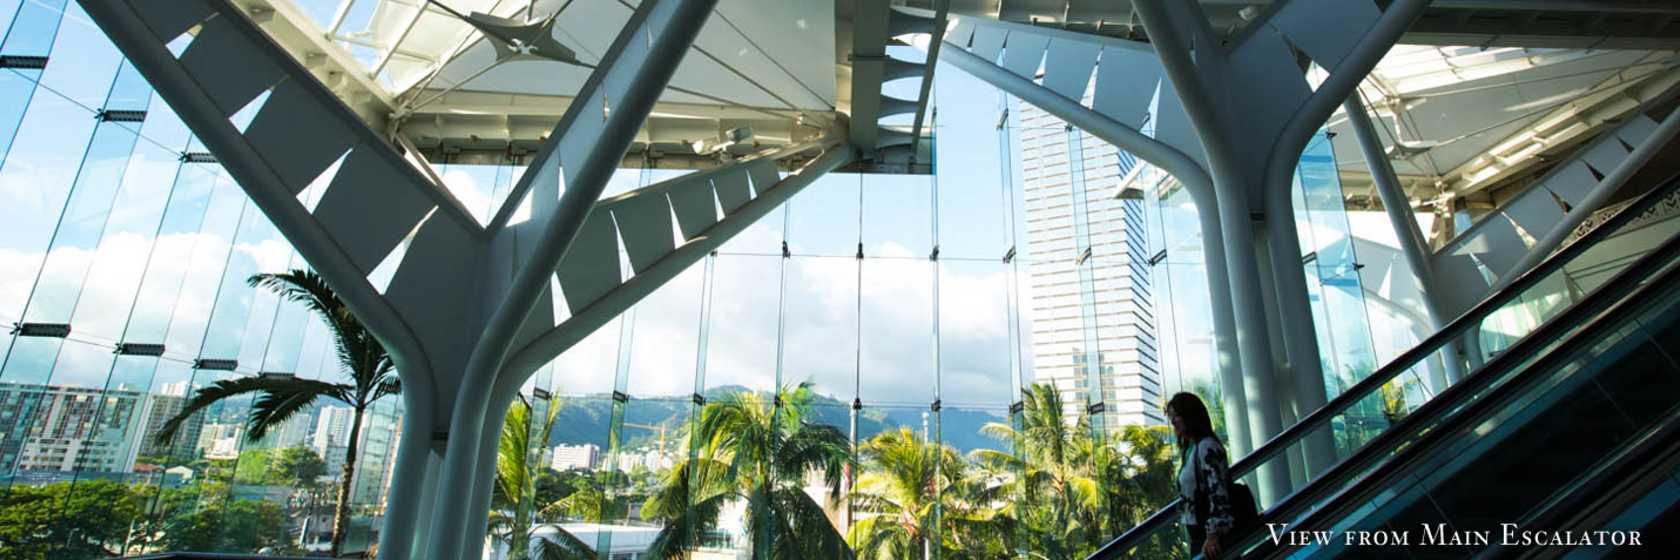 Main Escalator View HCC